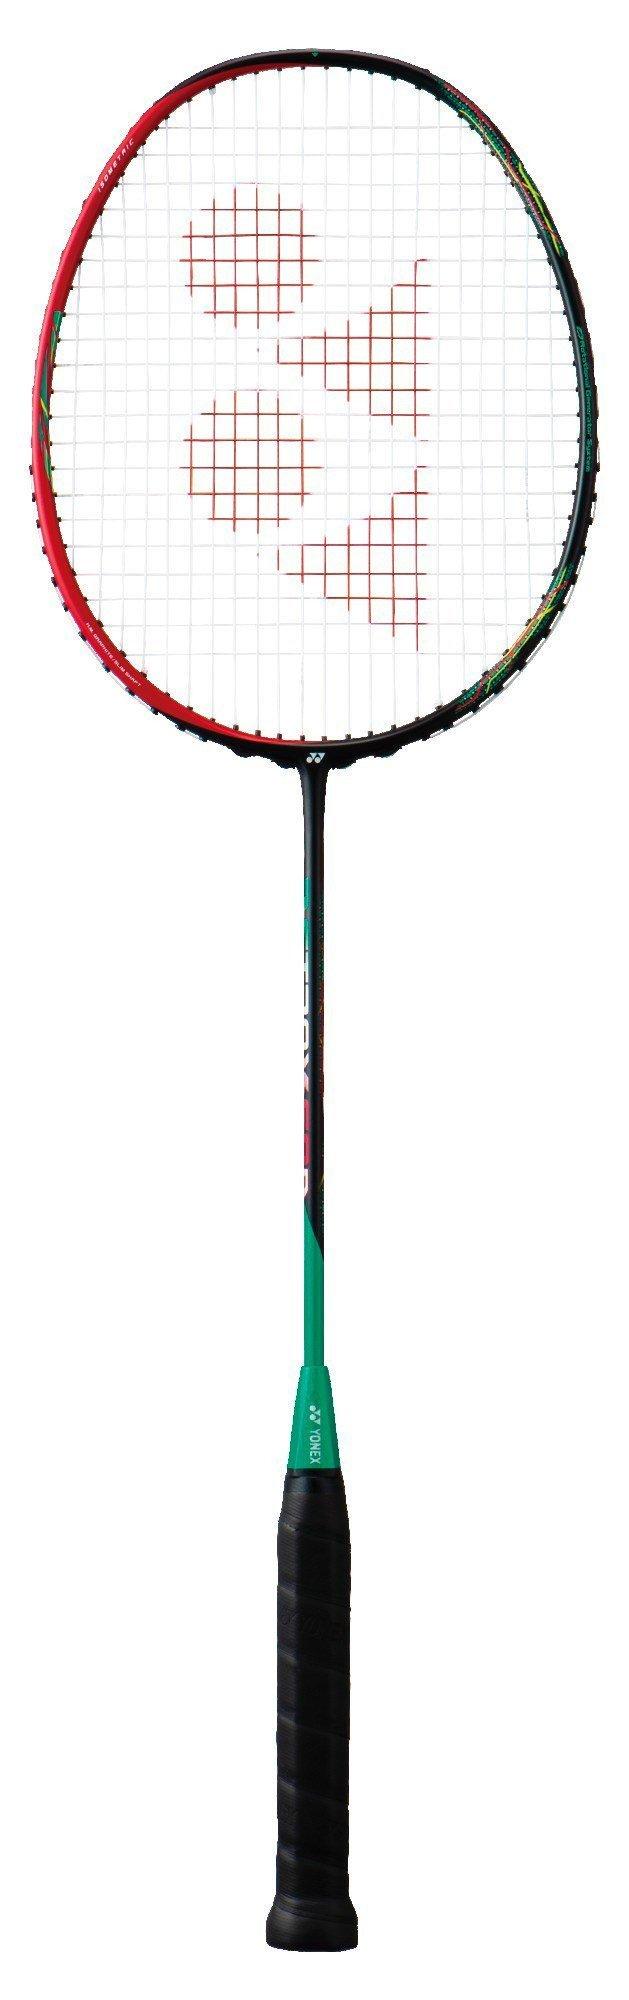 Yonex Astrox 68D Badmintonketcher